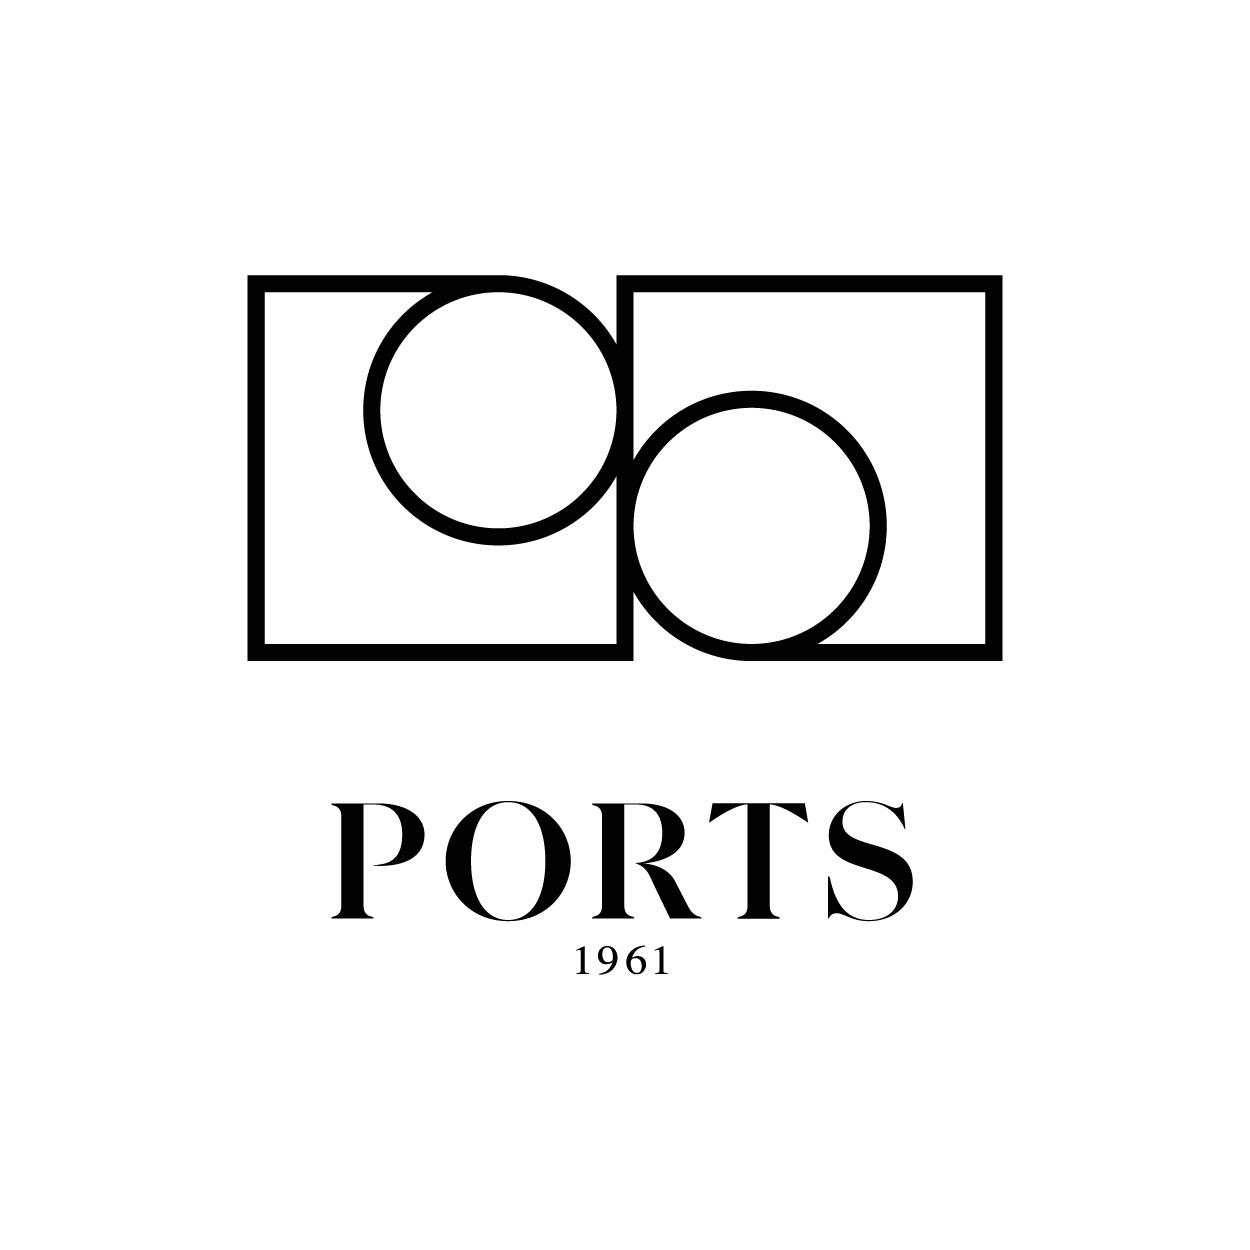 Ports1961_Logo_600x600_April_2021.jpg